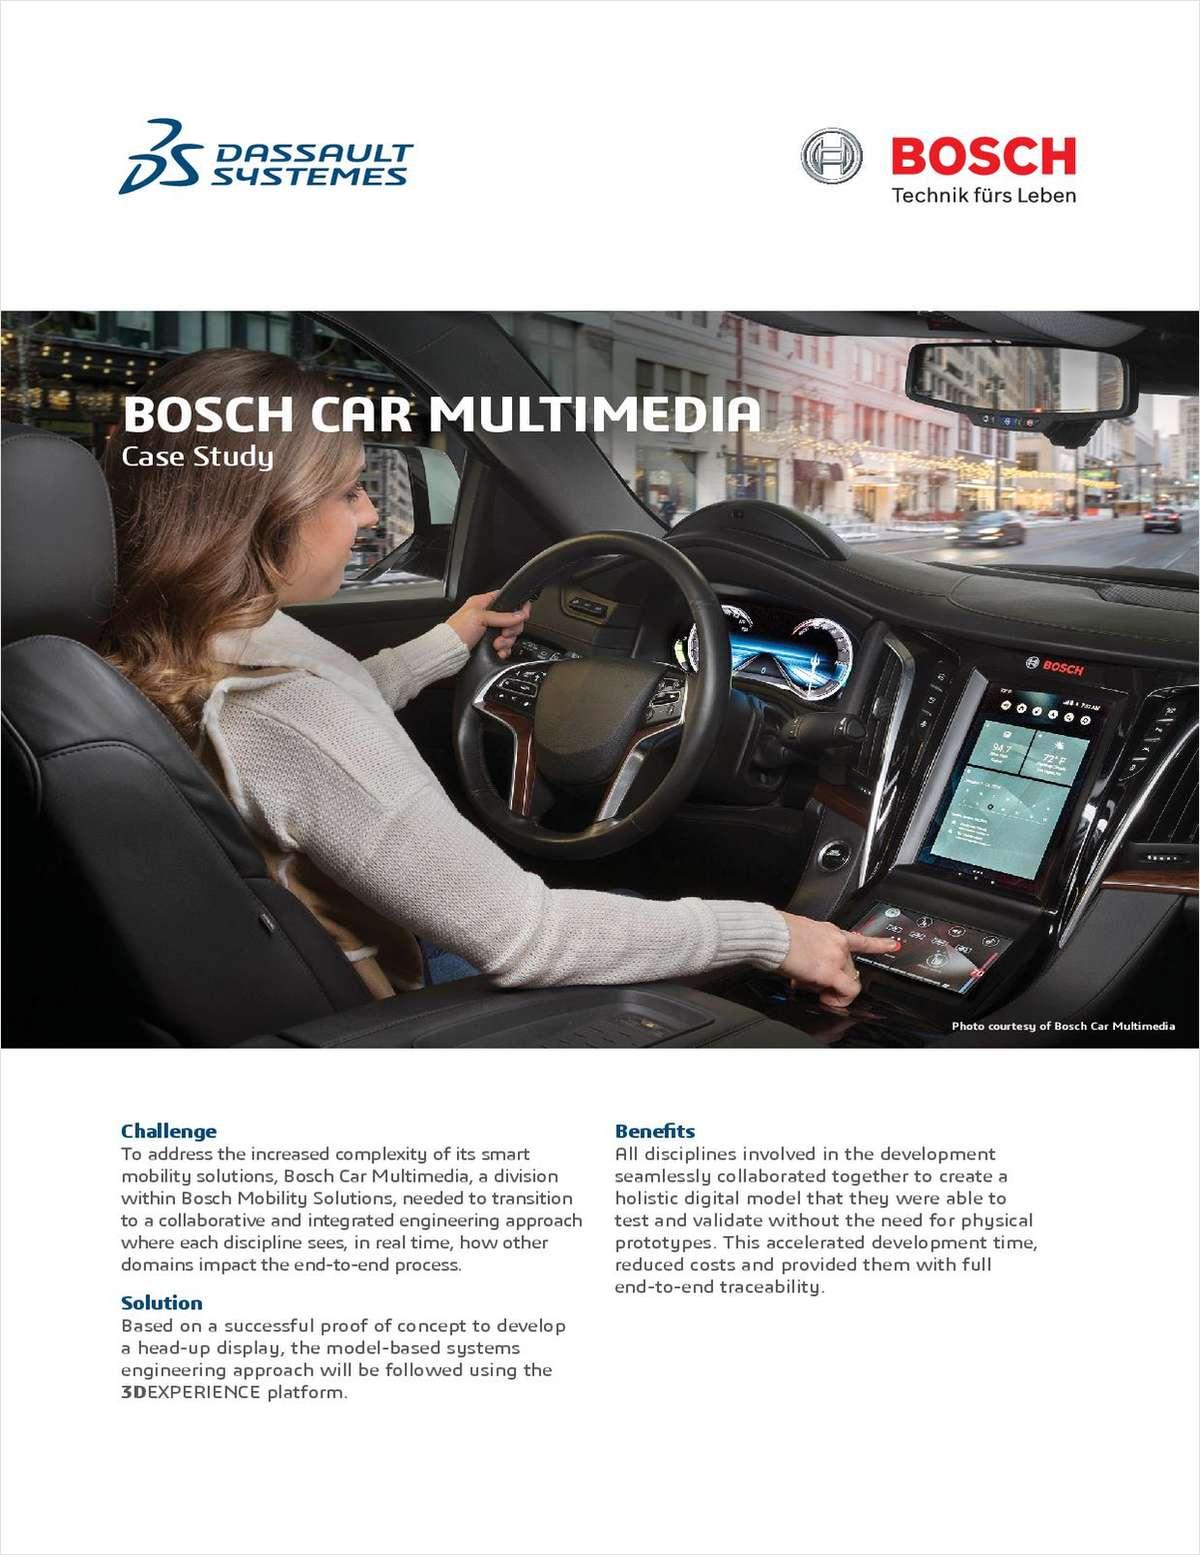 Bosch Car Multimedia